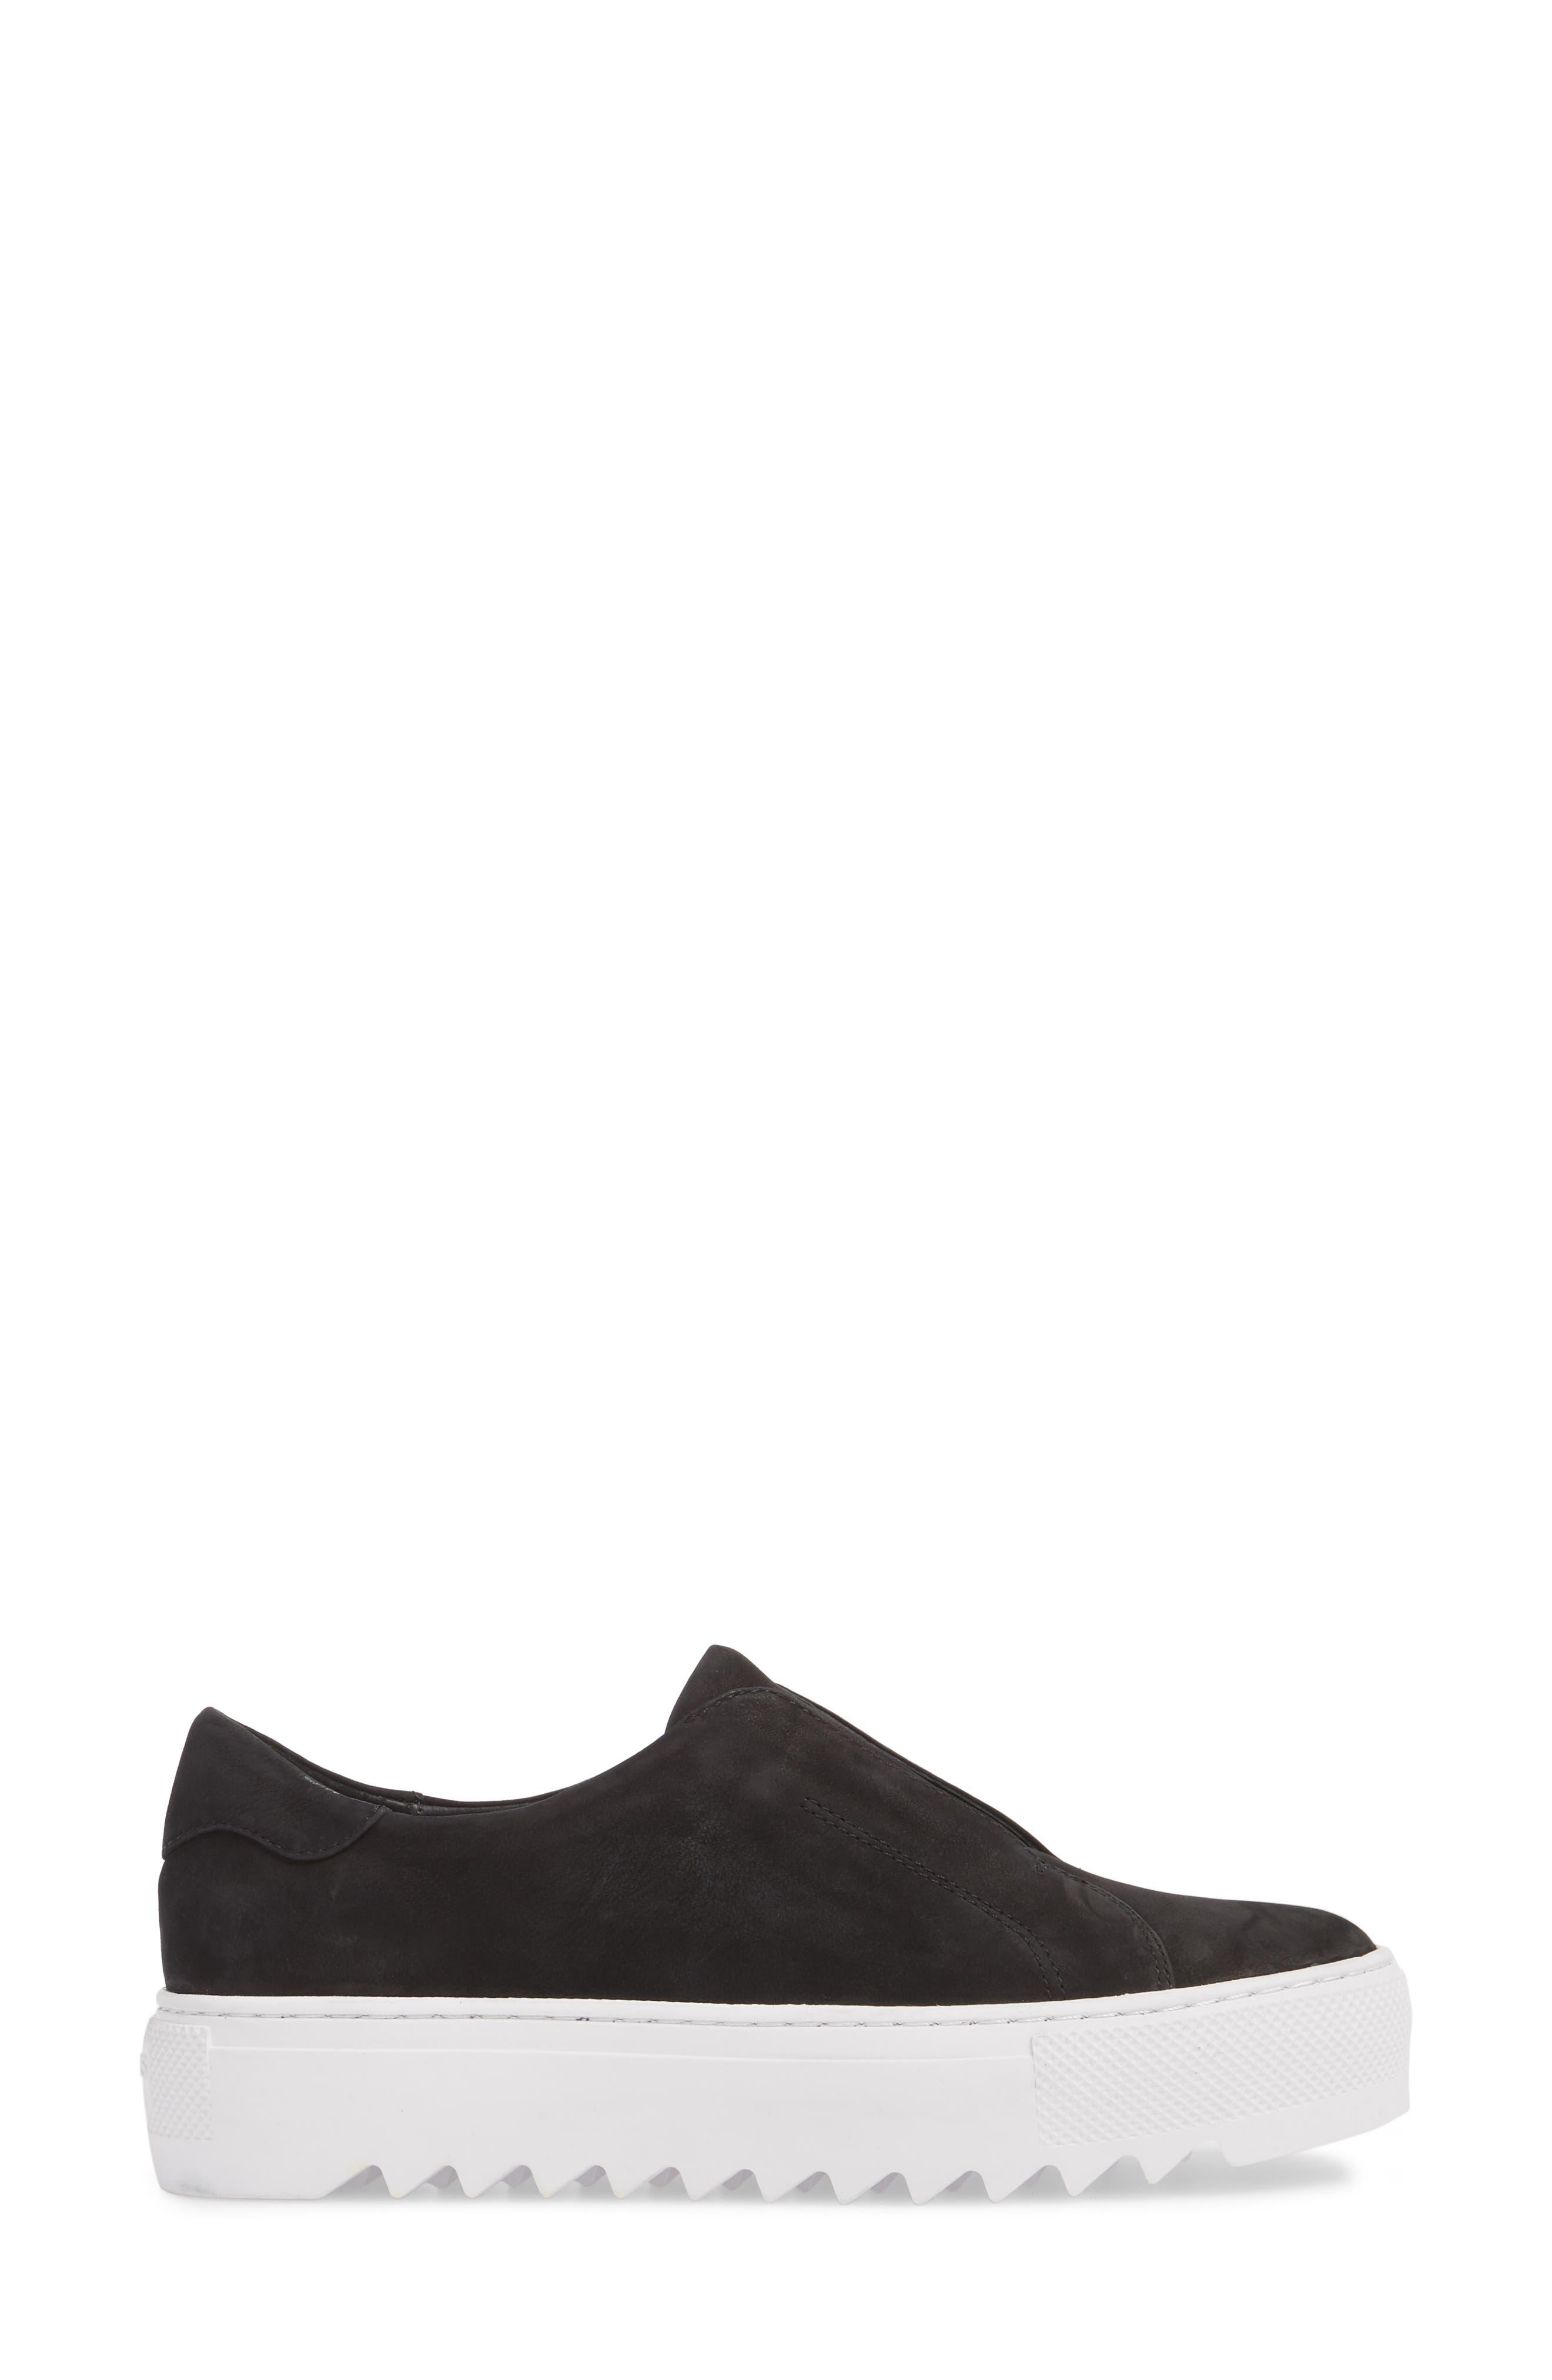 Spazo Slip-On Platform Sneaker,                             Alternate thumbnail 3, color,                             001